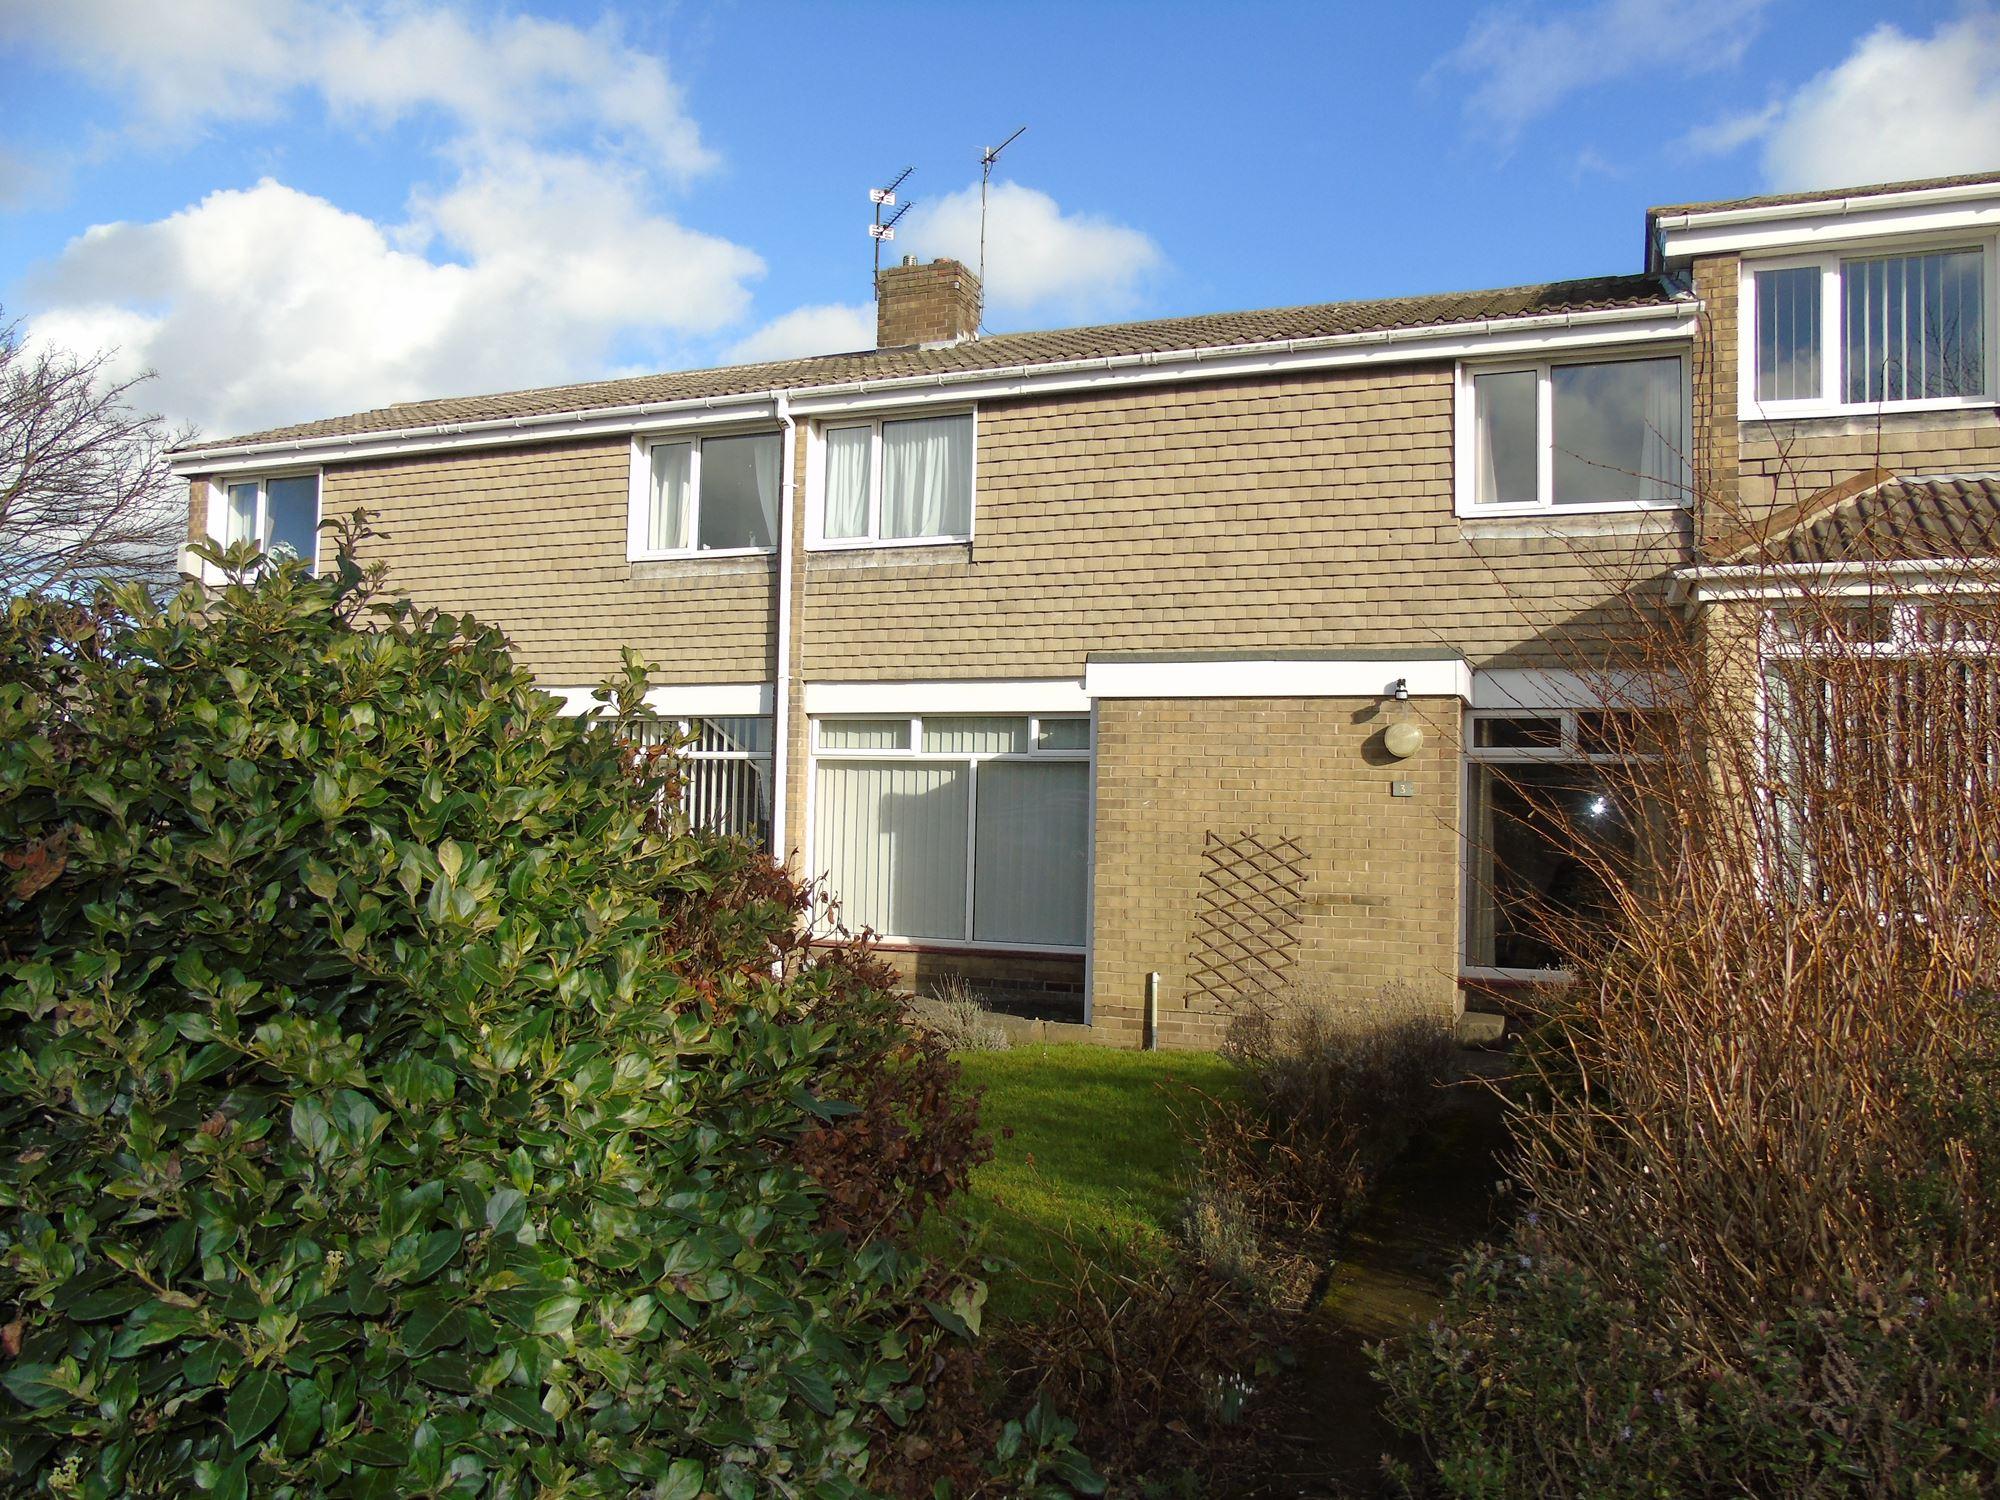 3 bedroom terraced house for sale glendale road for House for sale glendale